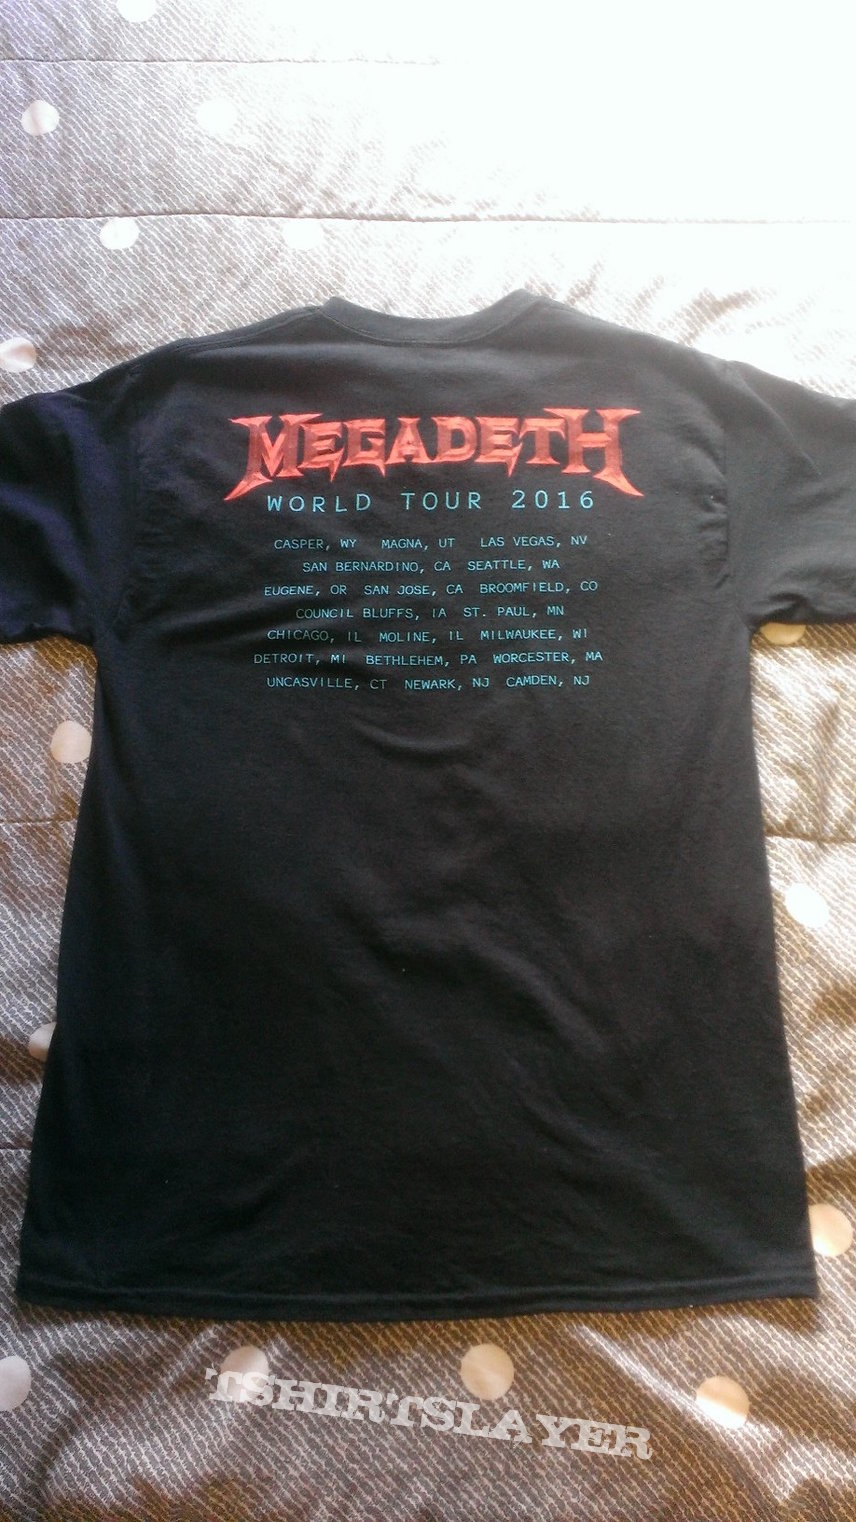 Megadeth: VIsual Prowess/World Tour 2016 shirt